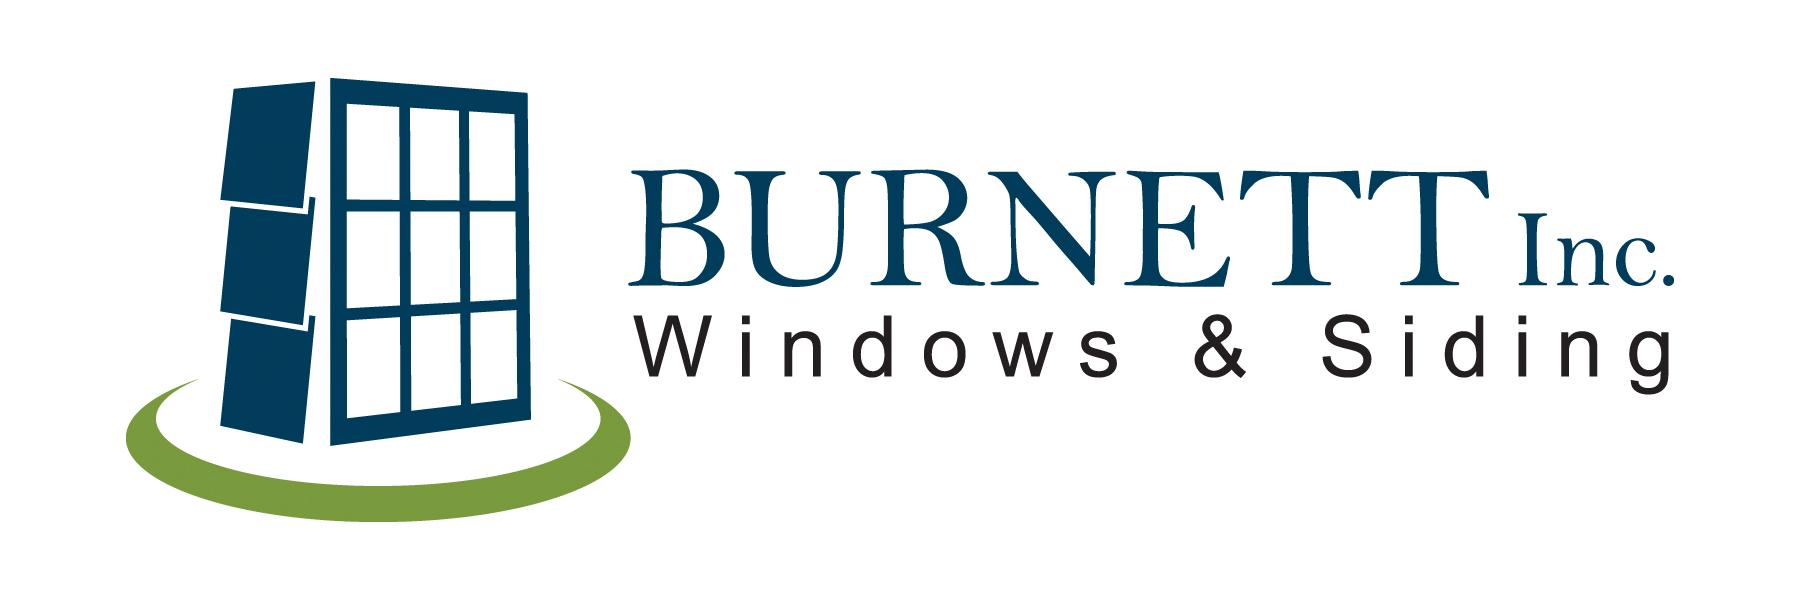 Burnett Windows & Siding, Inc. - Tulsa, OK